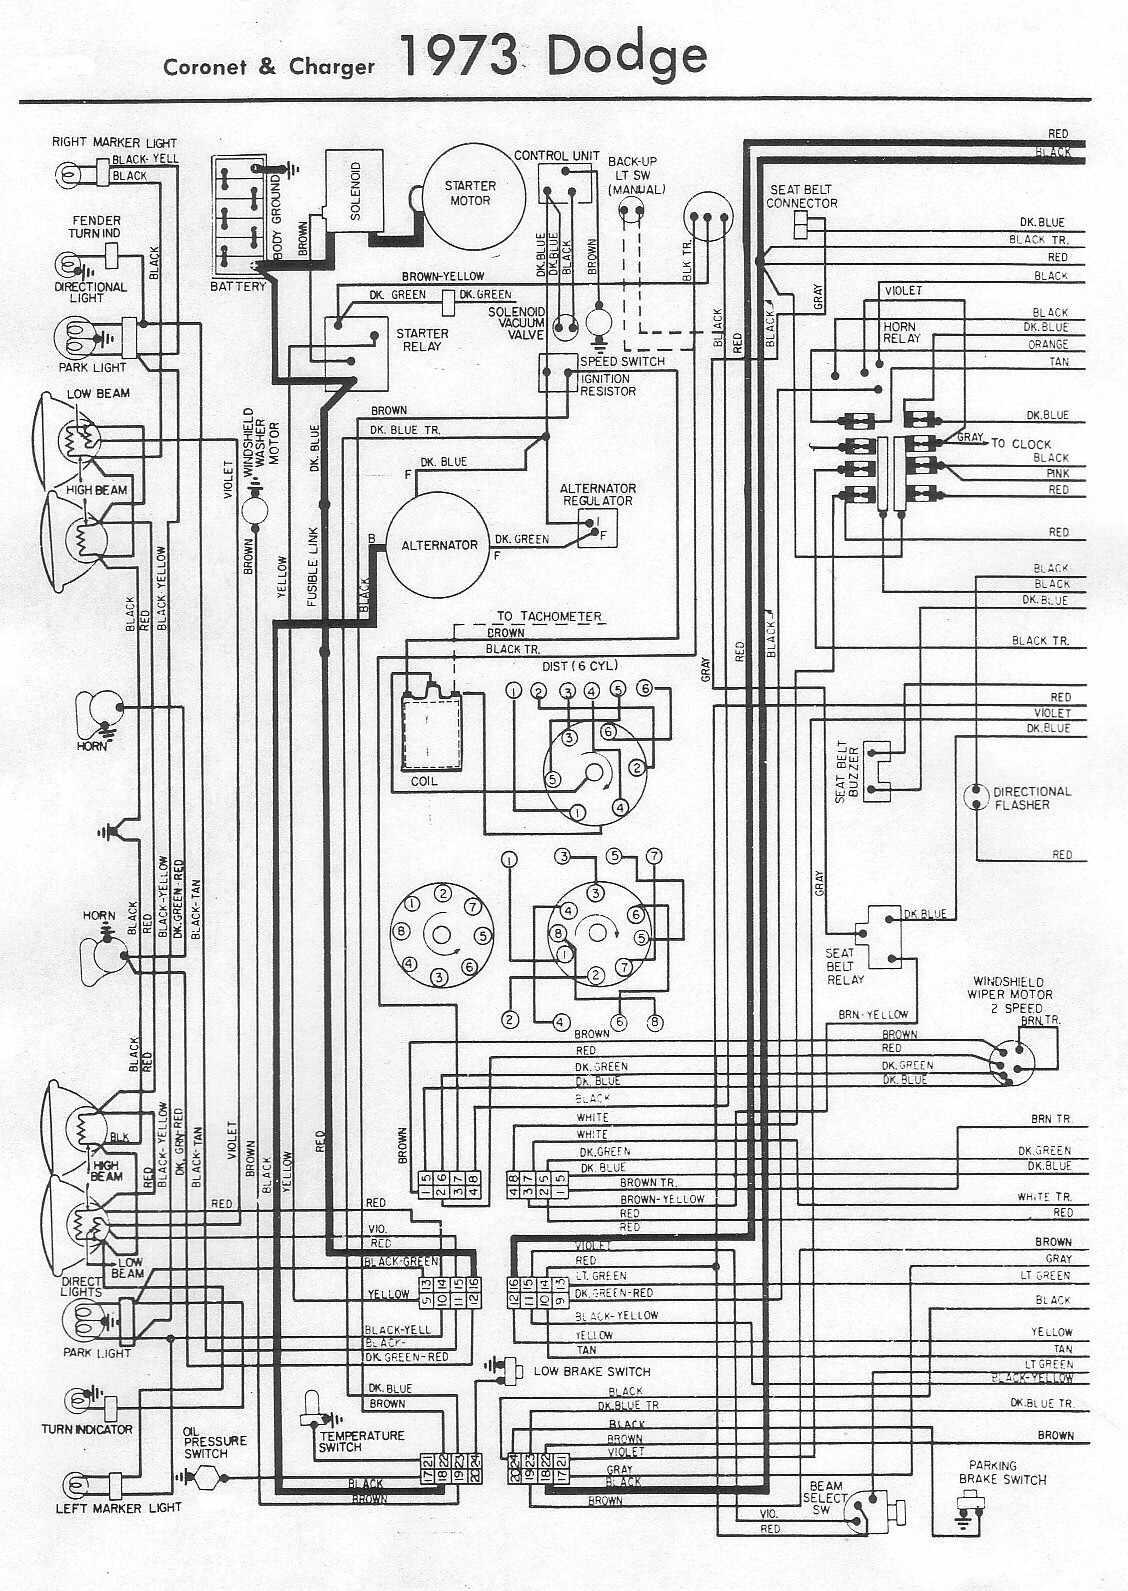 Download Now: 73 Dodge Wiring | ePANEL Digital Books on mic wiring diagram, radio control wiring diagram, usb flash drive wiring diagram, led wiring diagram, buzzer wiring diagram, tv antenna wiring diagram, voltage wiring diagram, projector wiring diagram, 12v solar panel wiring diagram, camera wiring diagram, connector wiring diagram, speaker wiring diagram,